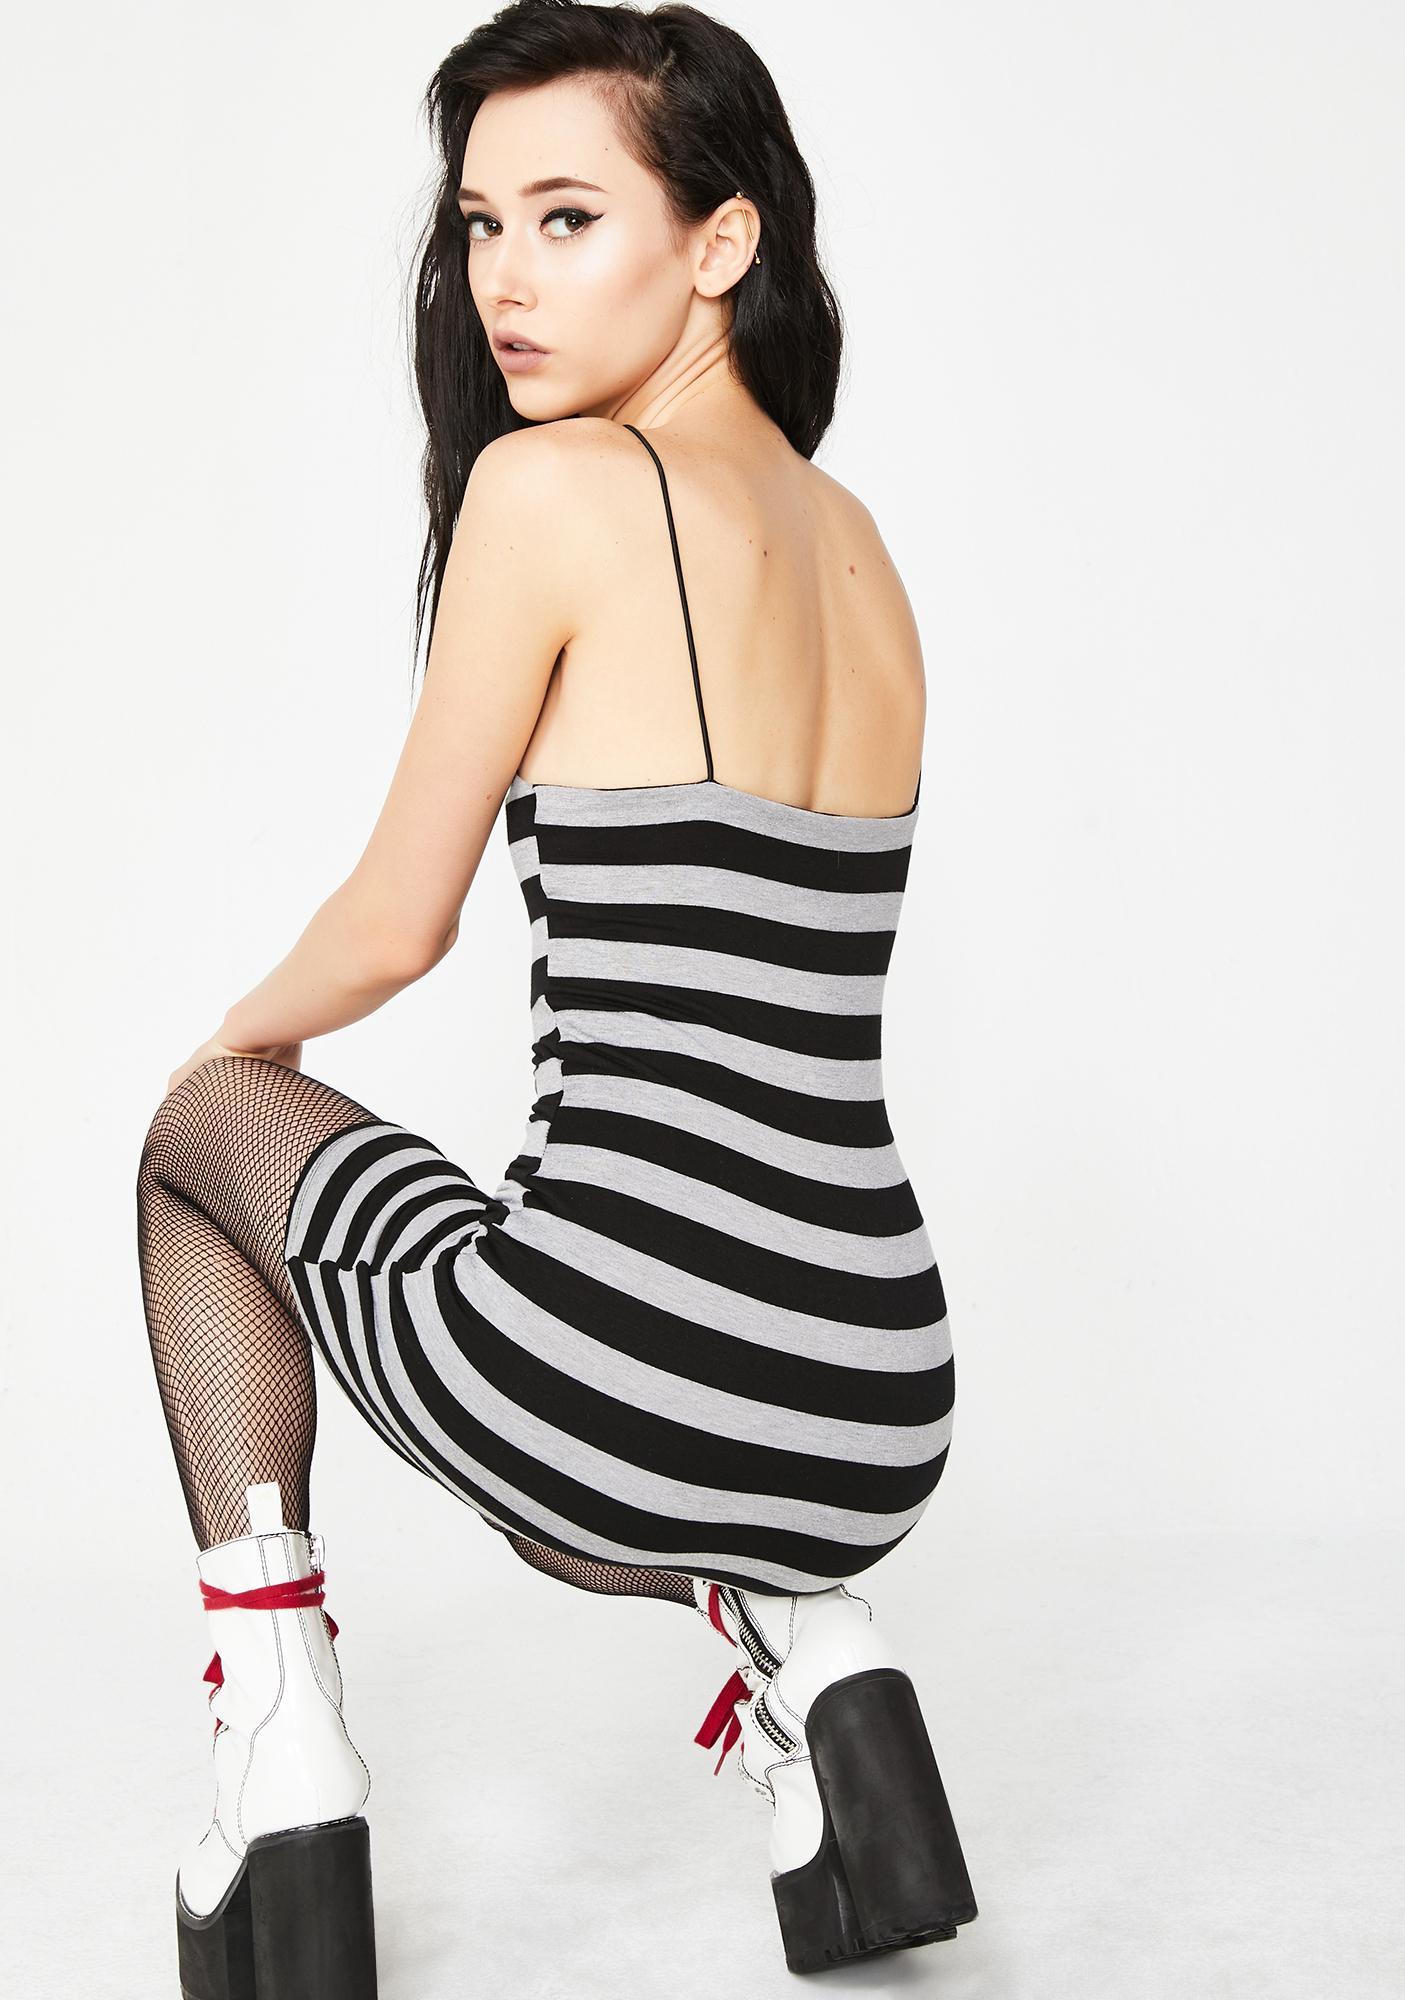 O Mighty Directed By Tim Burton Mini Dress